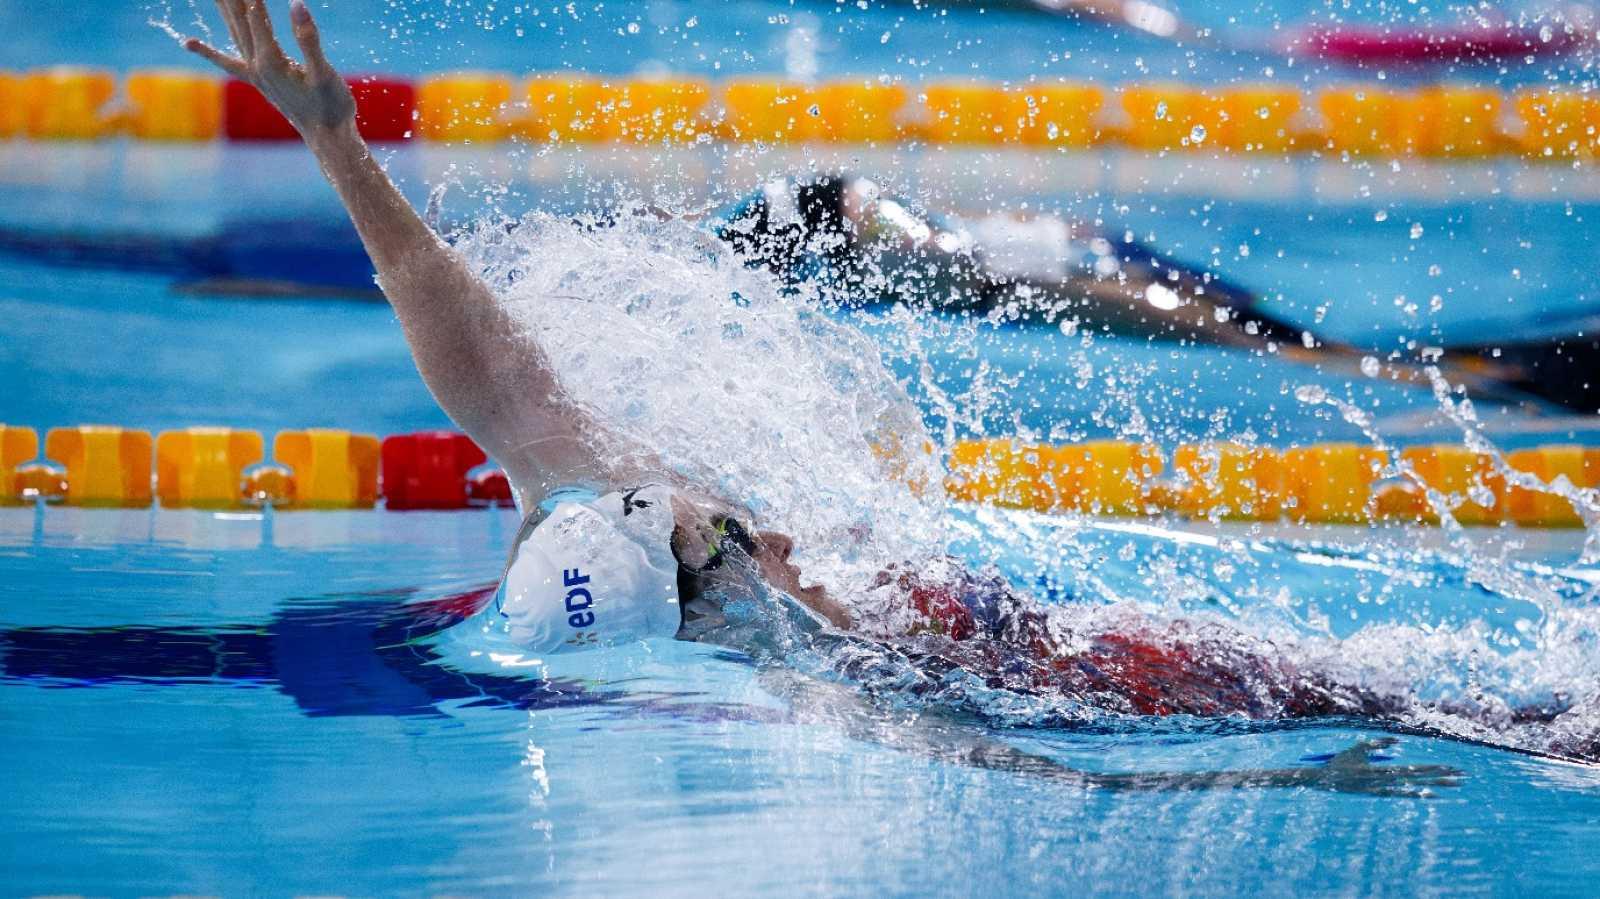 Natación - Campeonato de Europa en piscina corta. Sesión vespertina - 07/12/19 - ver ahora